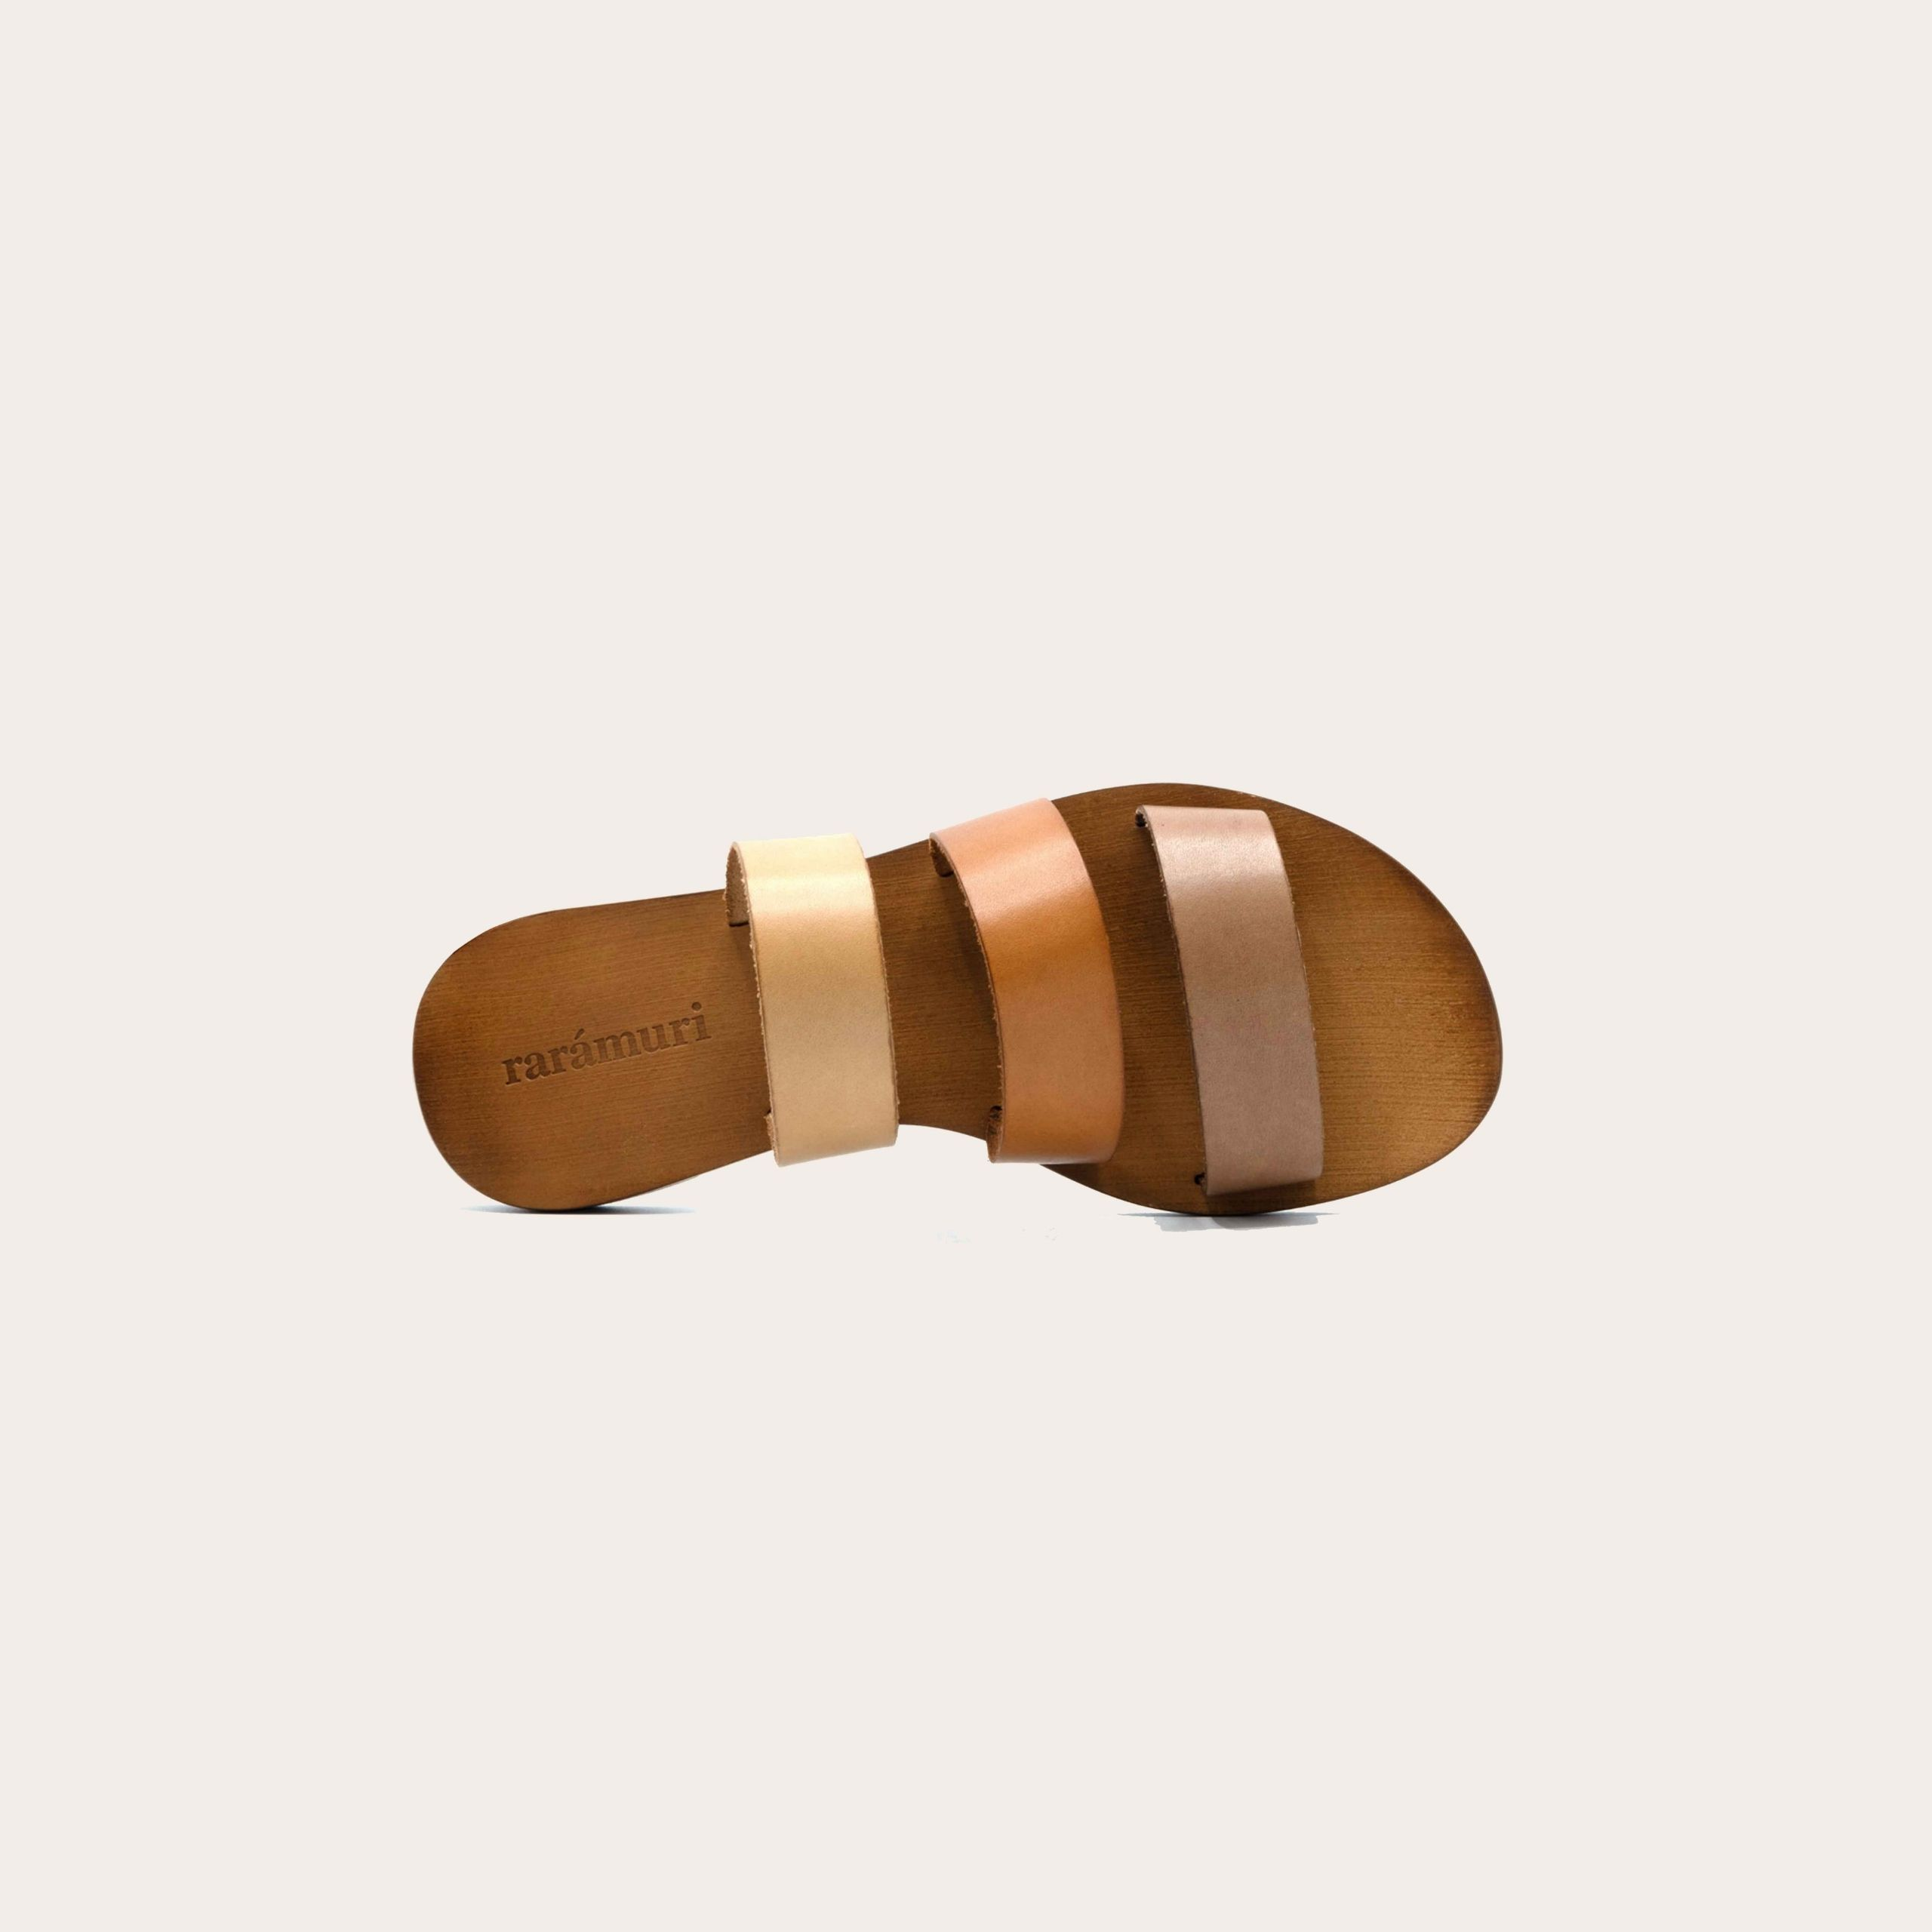 tijuana_3_lintsandalen sandals travelsandals vegan sustainable sandals wikkelsandalen